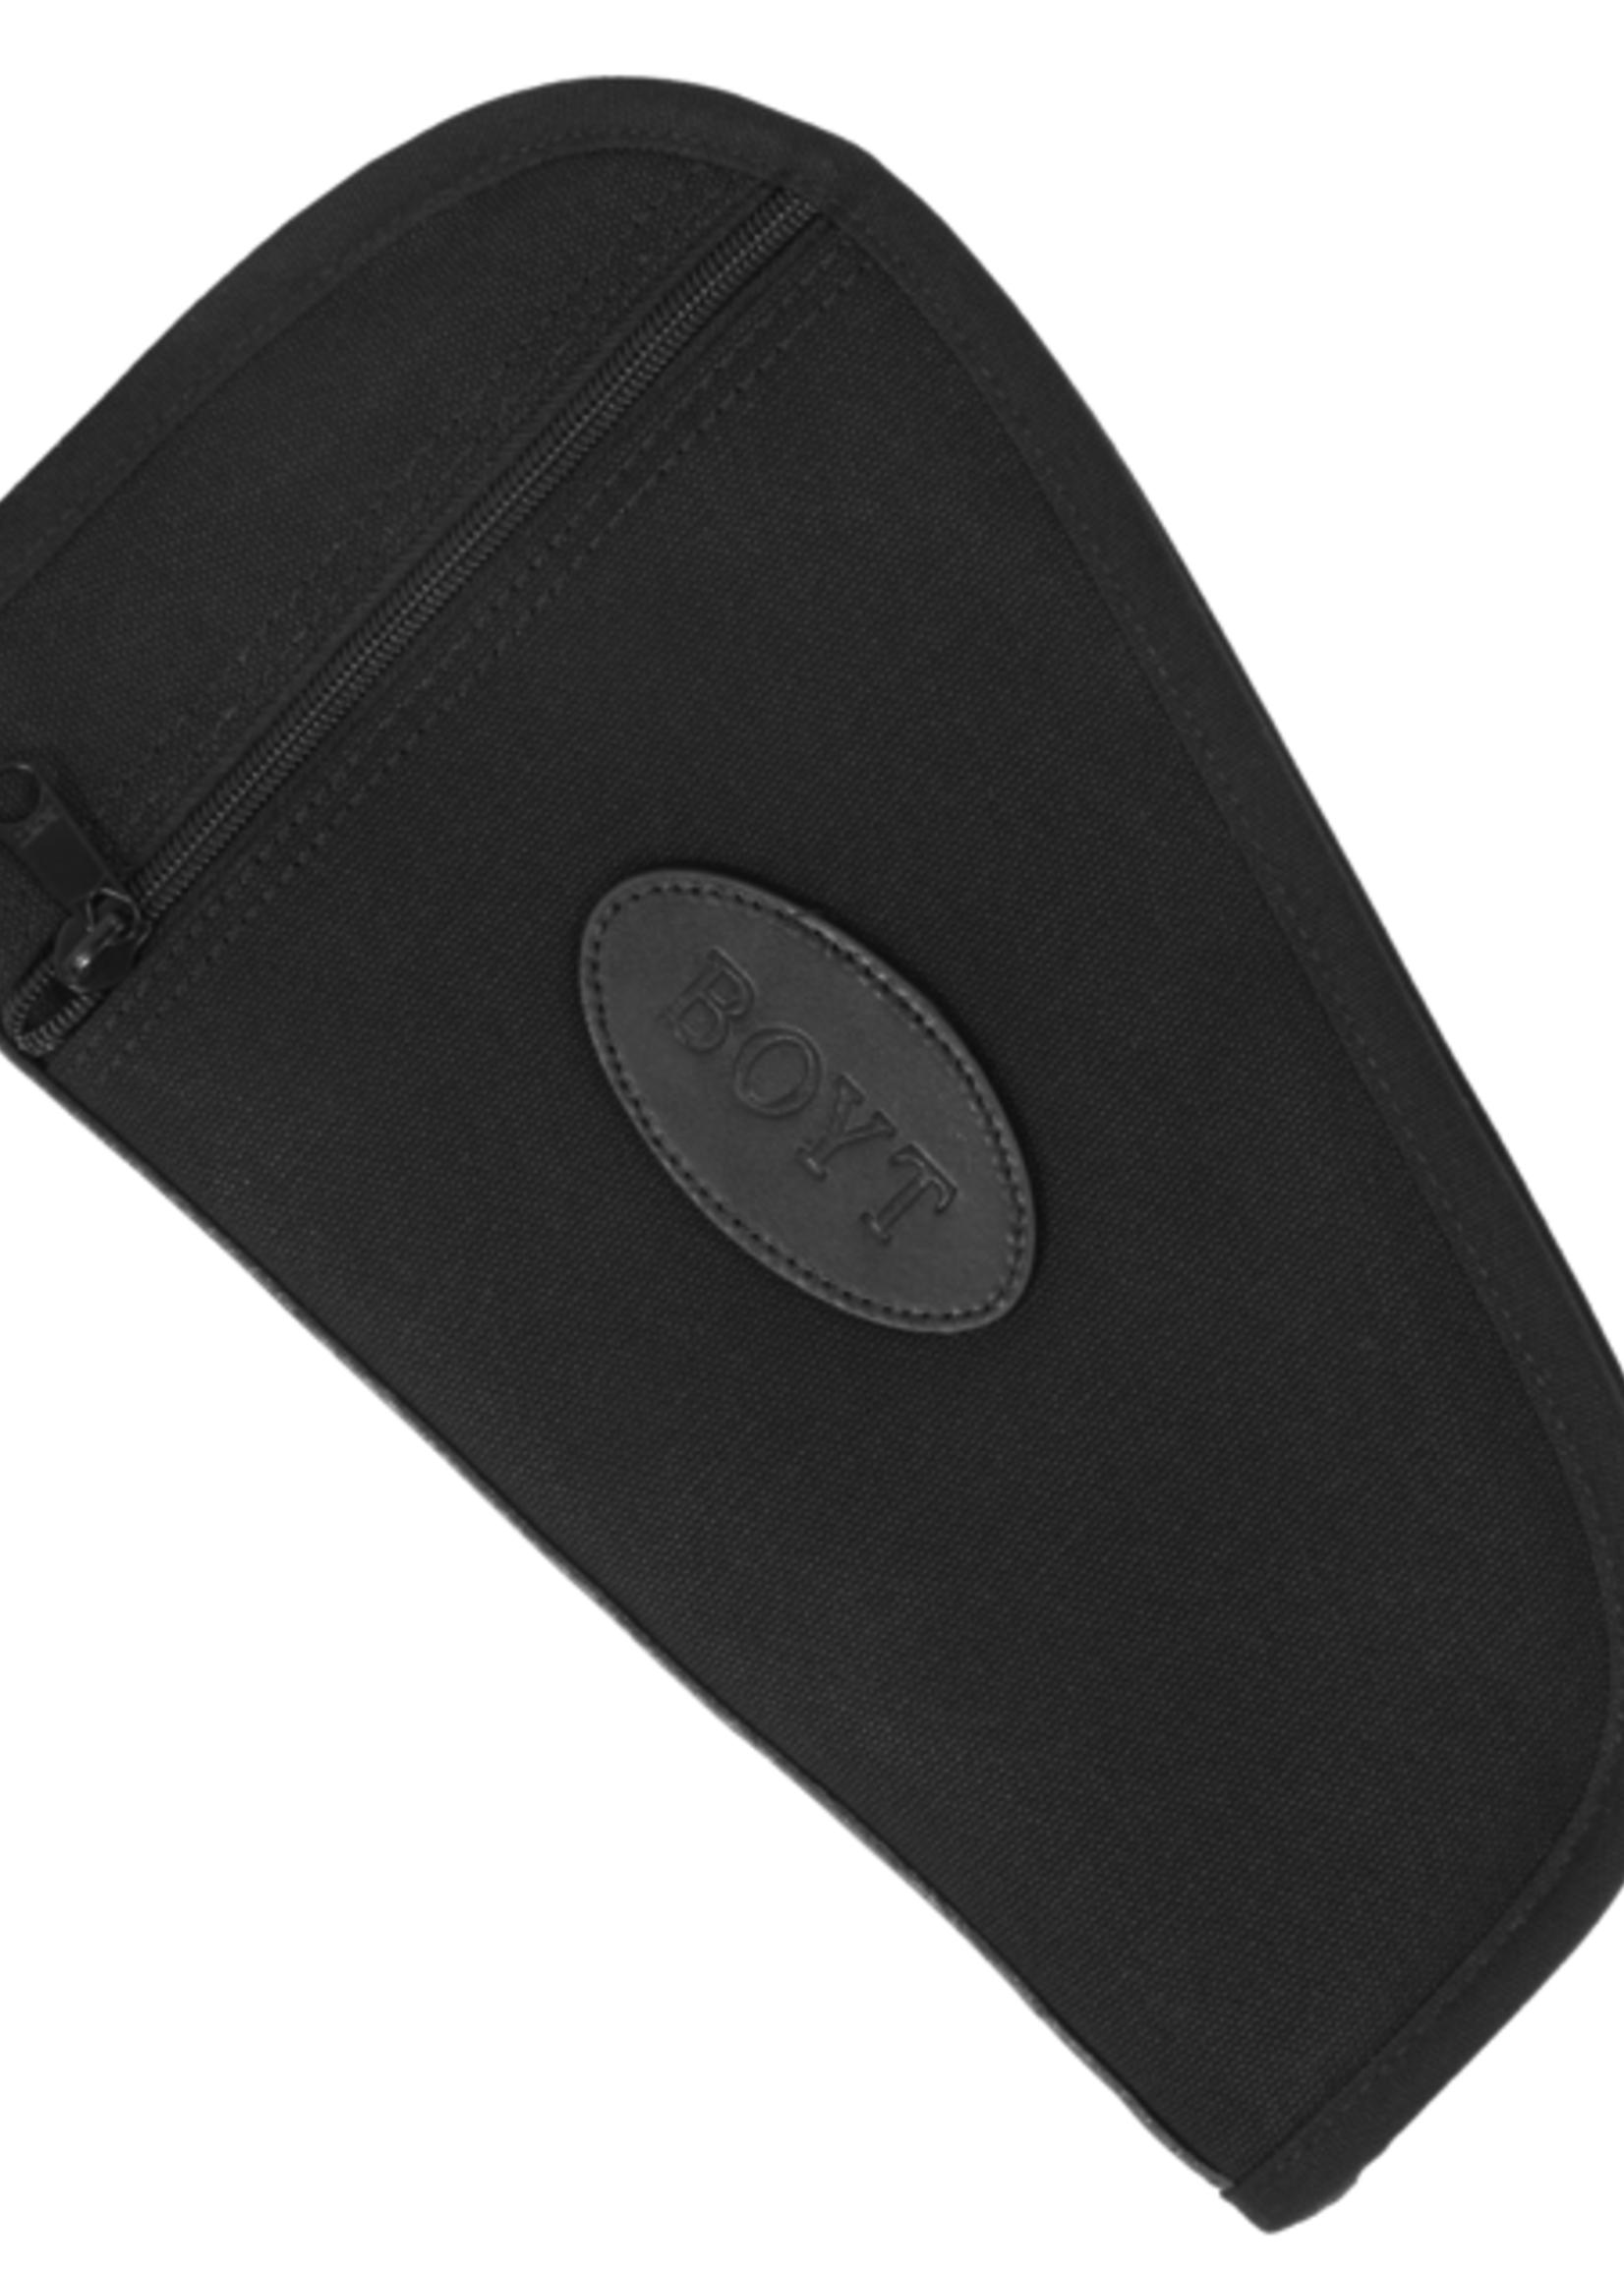 "BOYT HARNESS COMPANY Boyt Soft Handgun Case 14"" w/ Pocket Black"